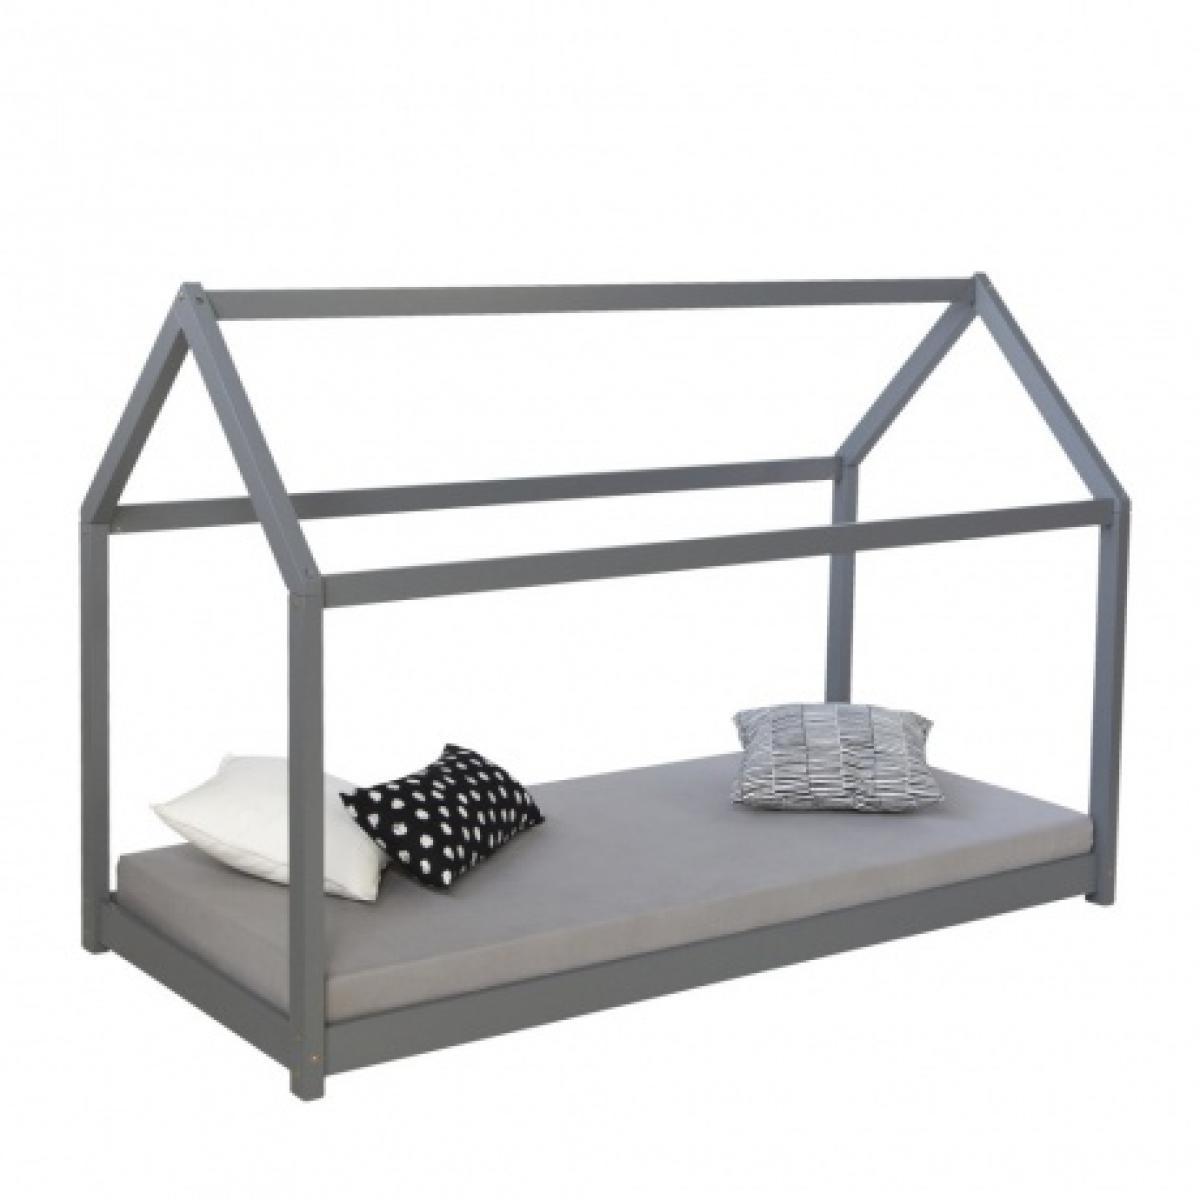 Homestyle4U Lit cabane enfant en bois gris 90 x 200cm